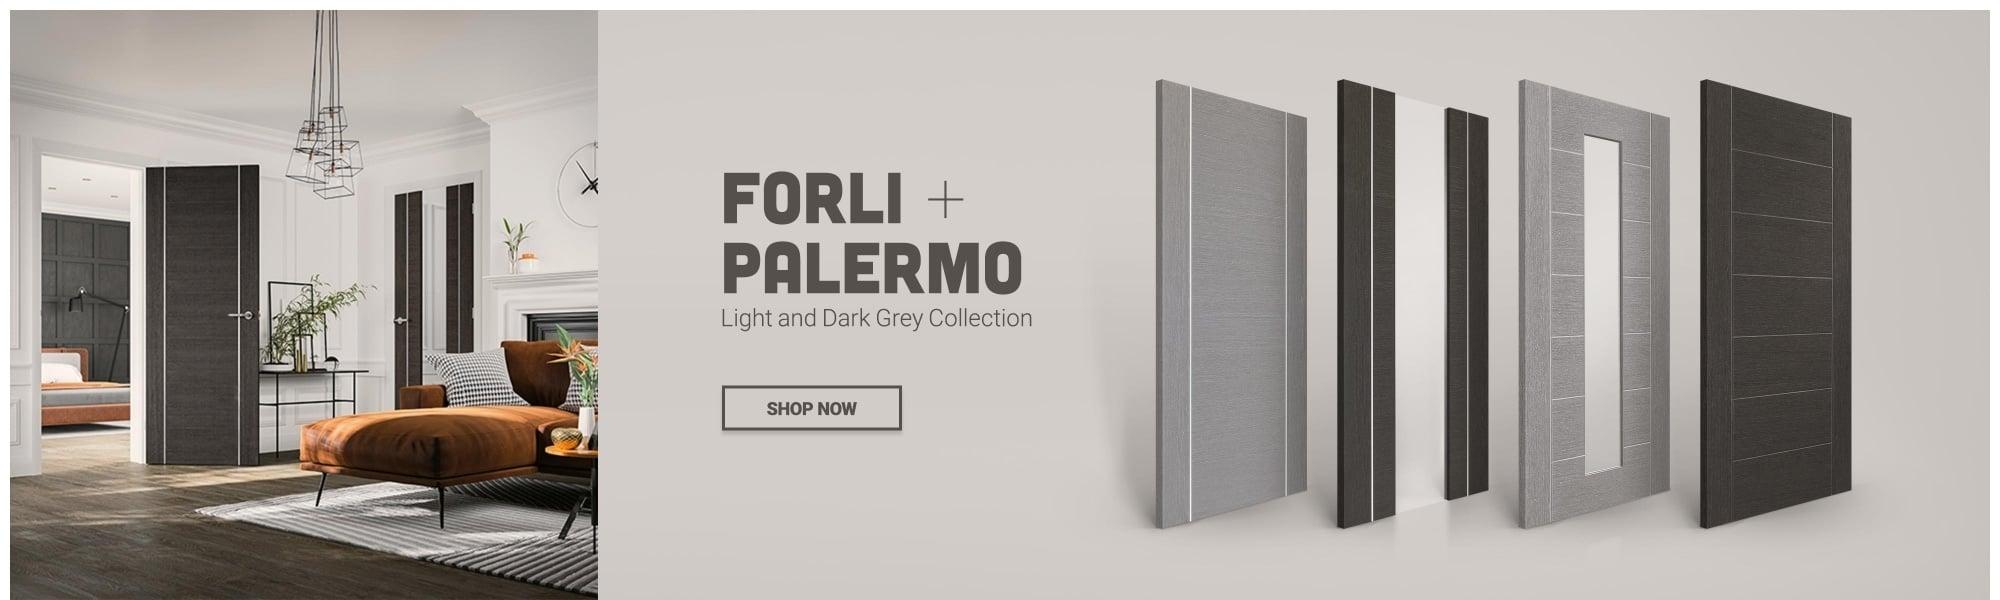 Forli & Palermo